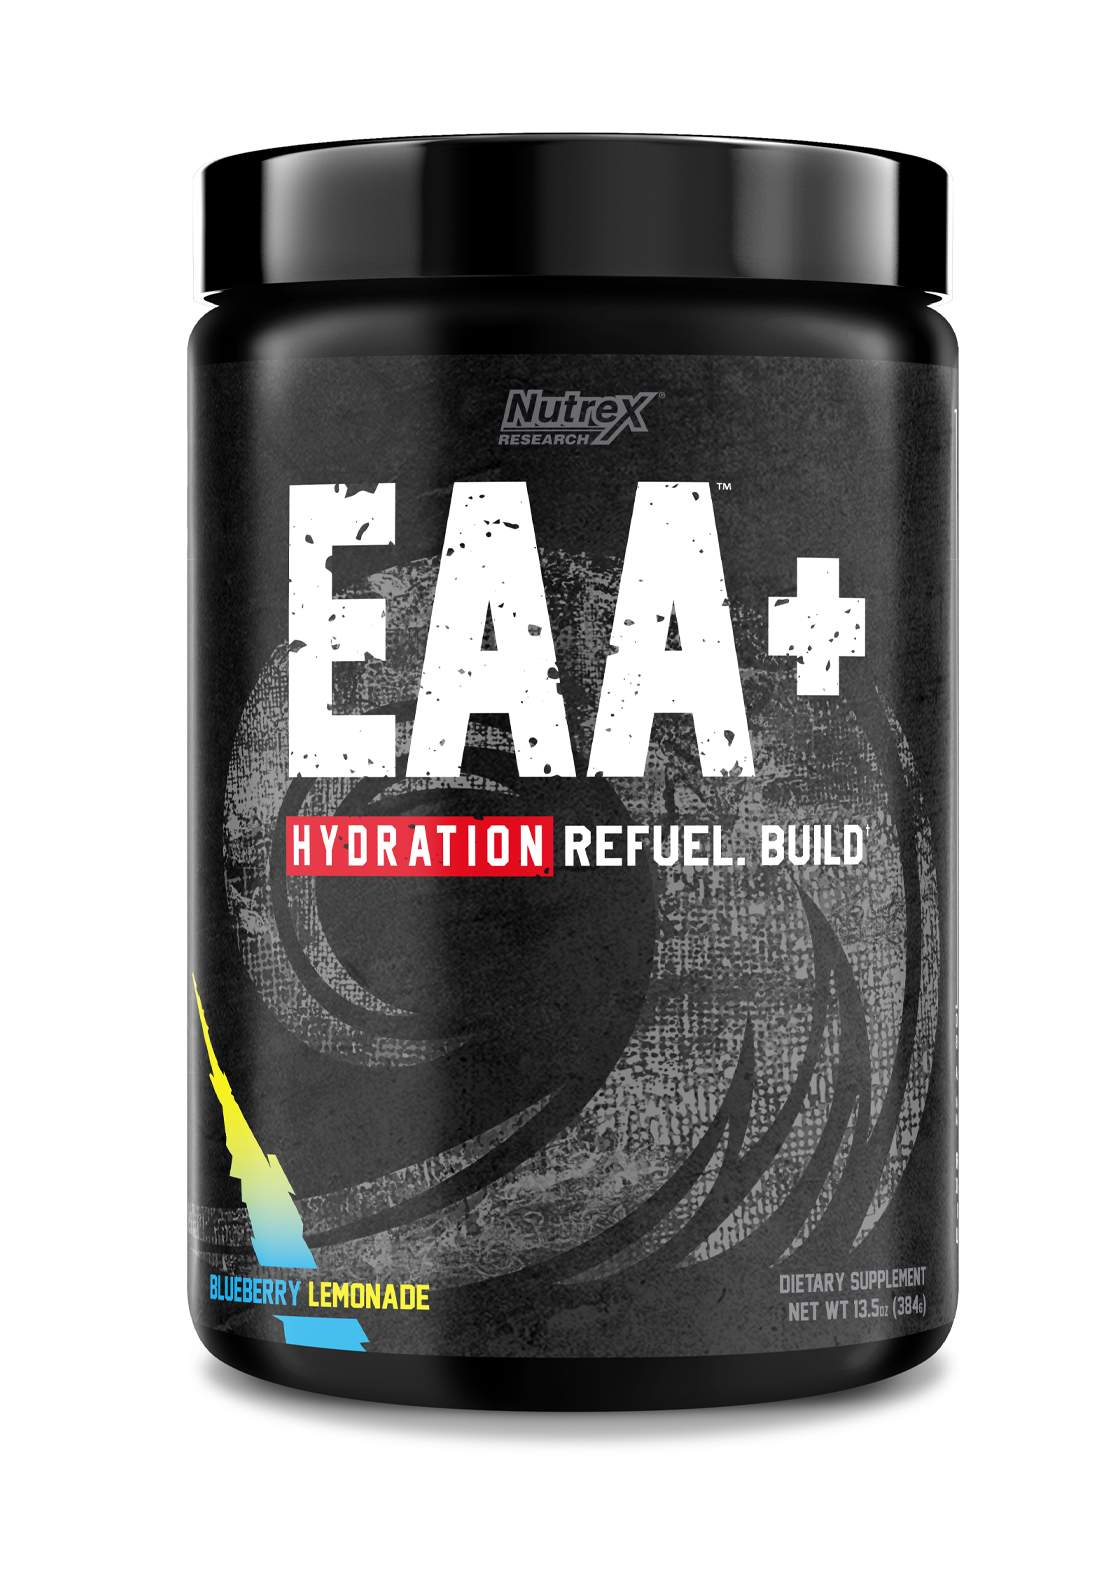 Nutrex Research EAA Hydration Refulel Build Blueberry Lemonade   30 Serve مكمل احماض امينية